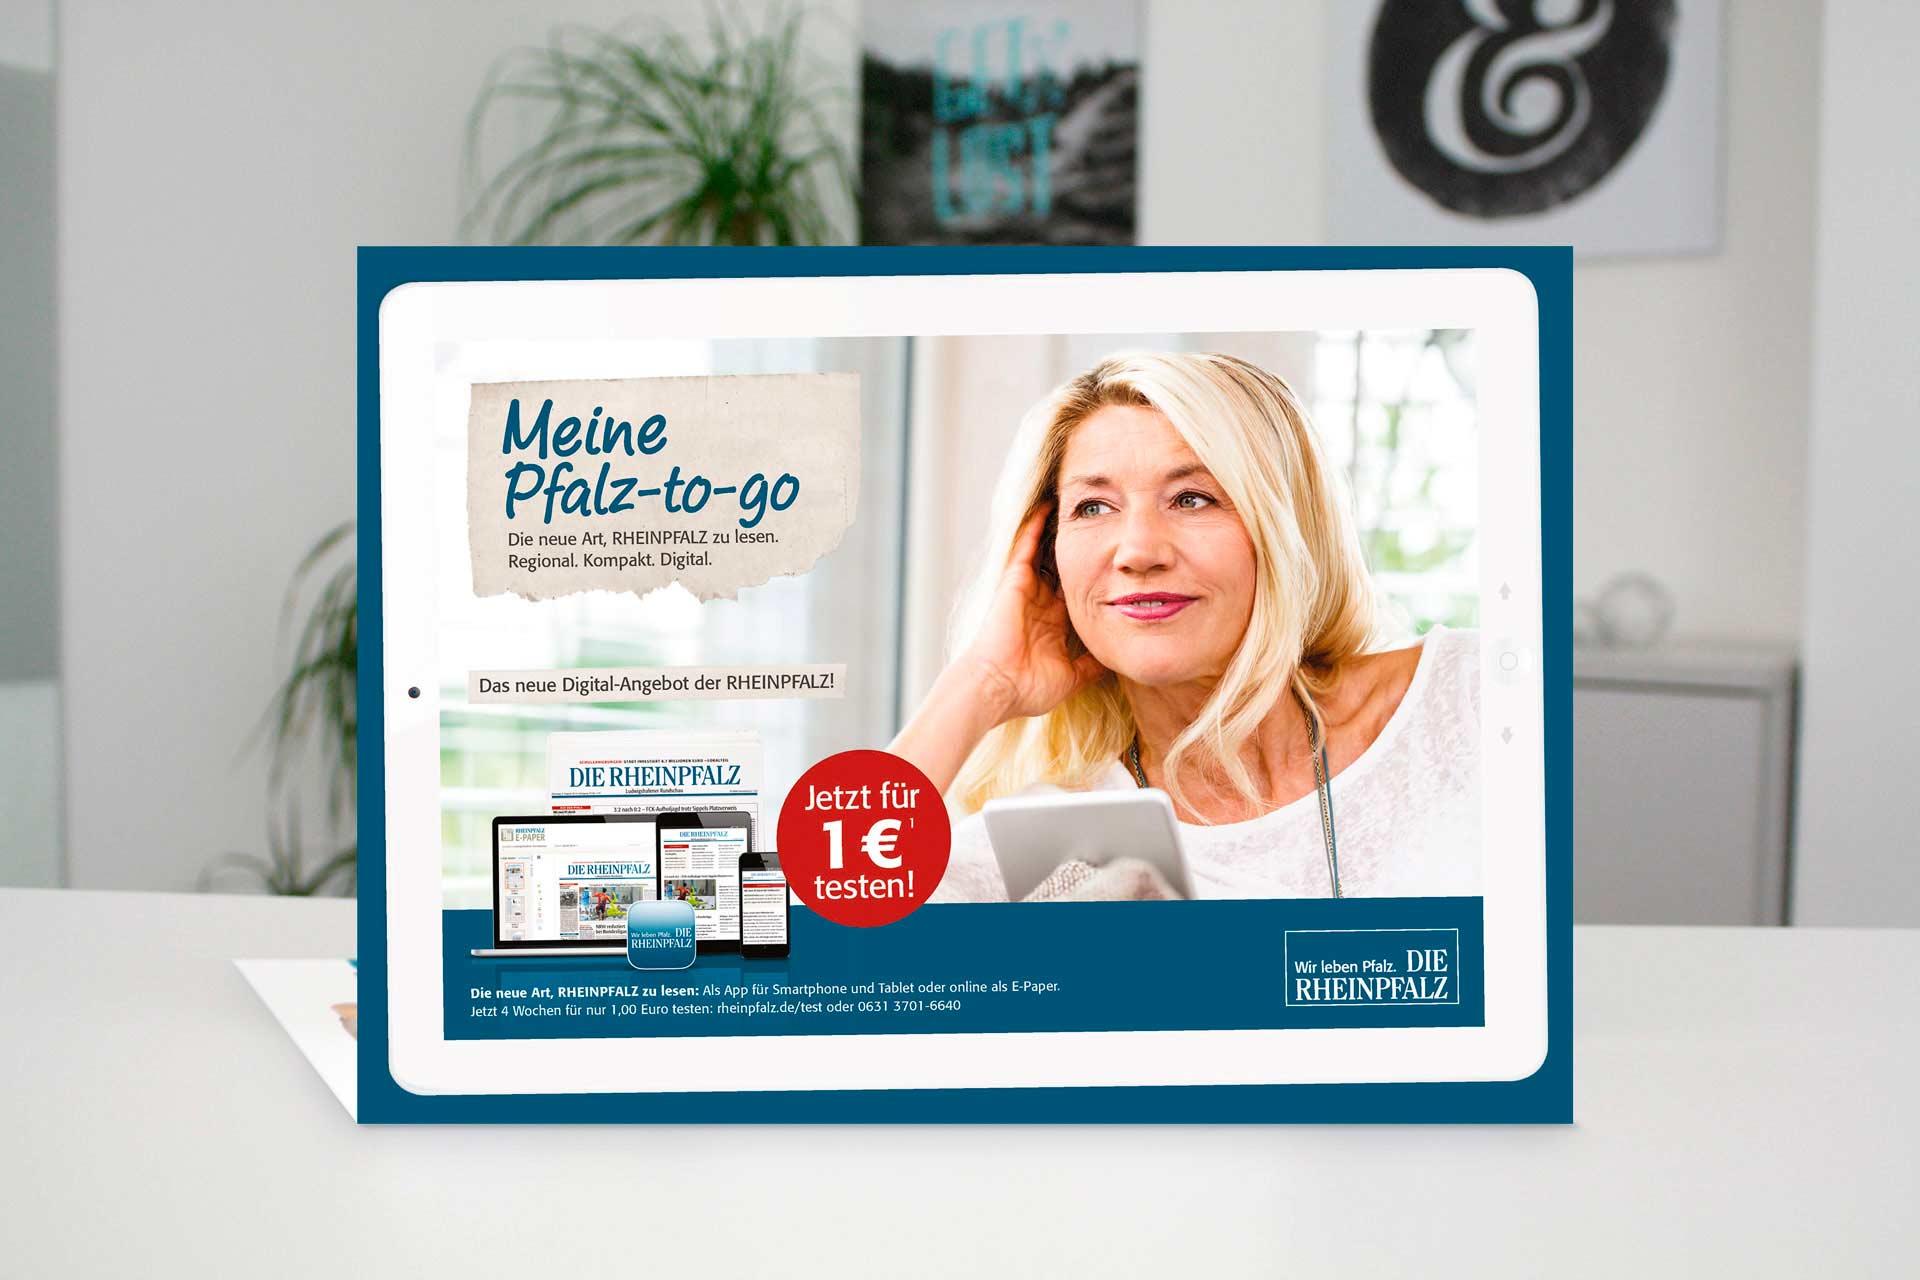 DIE RHEINPFALZ Meine Pfalz-to-go Mailing